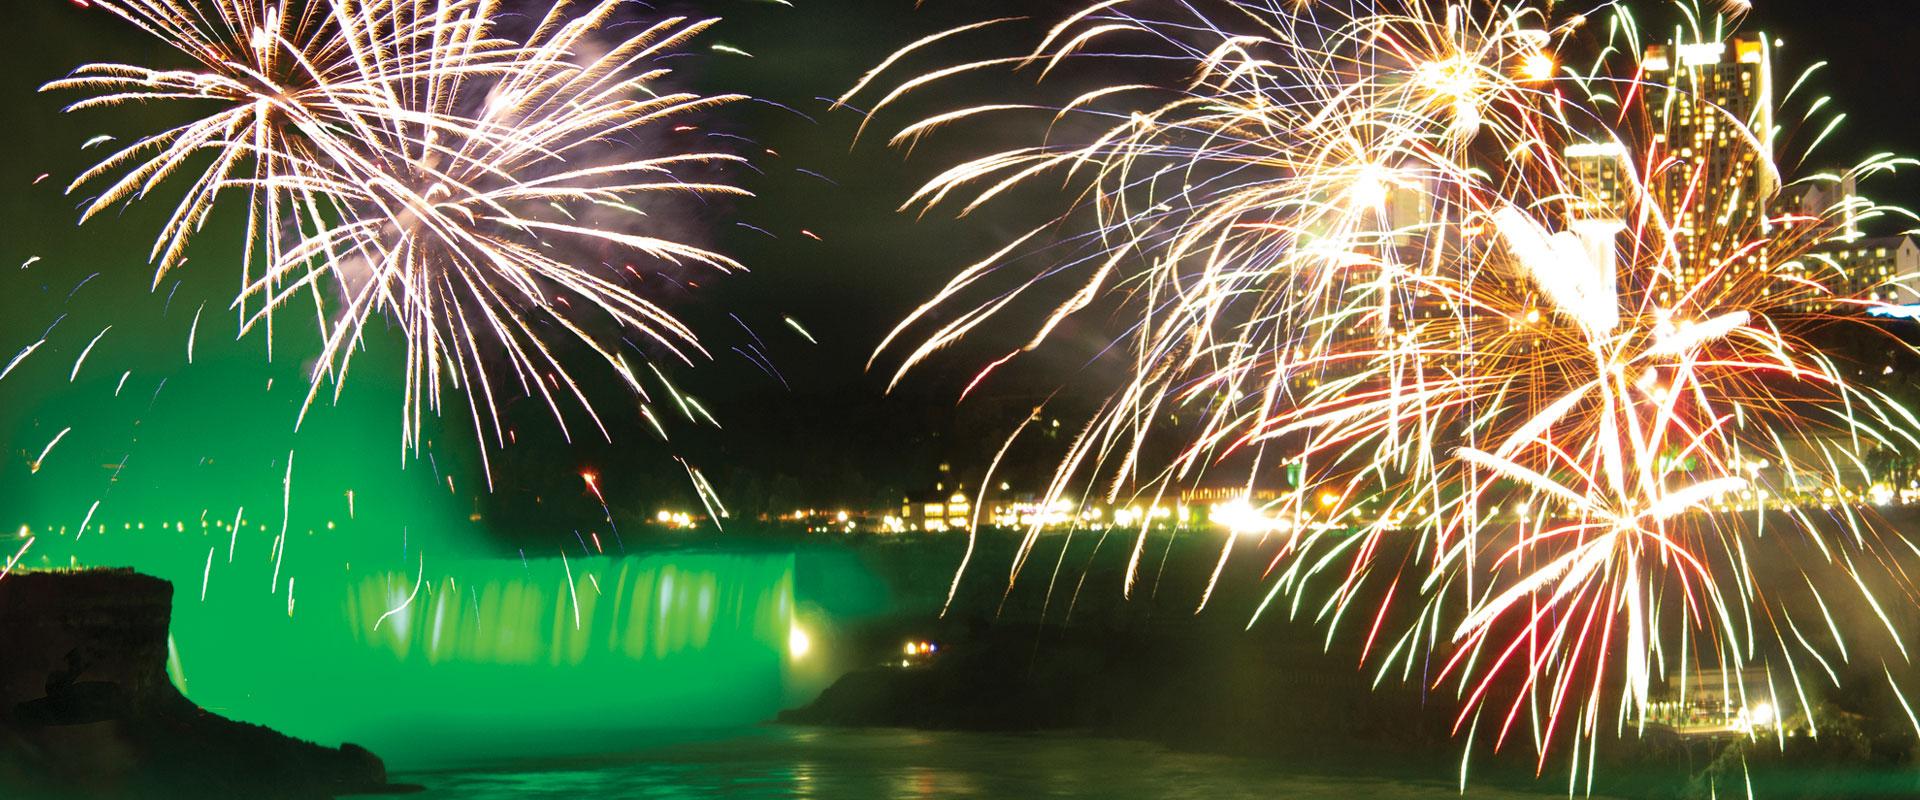 Niagara Falls Winter Tour and Winter Festival of Lights